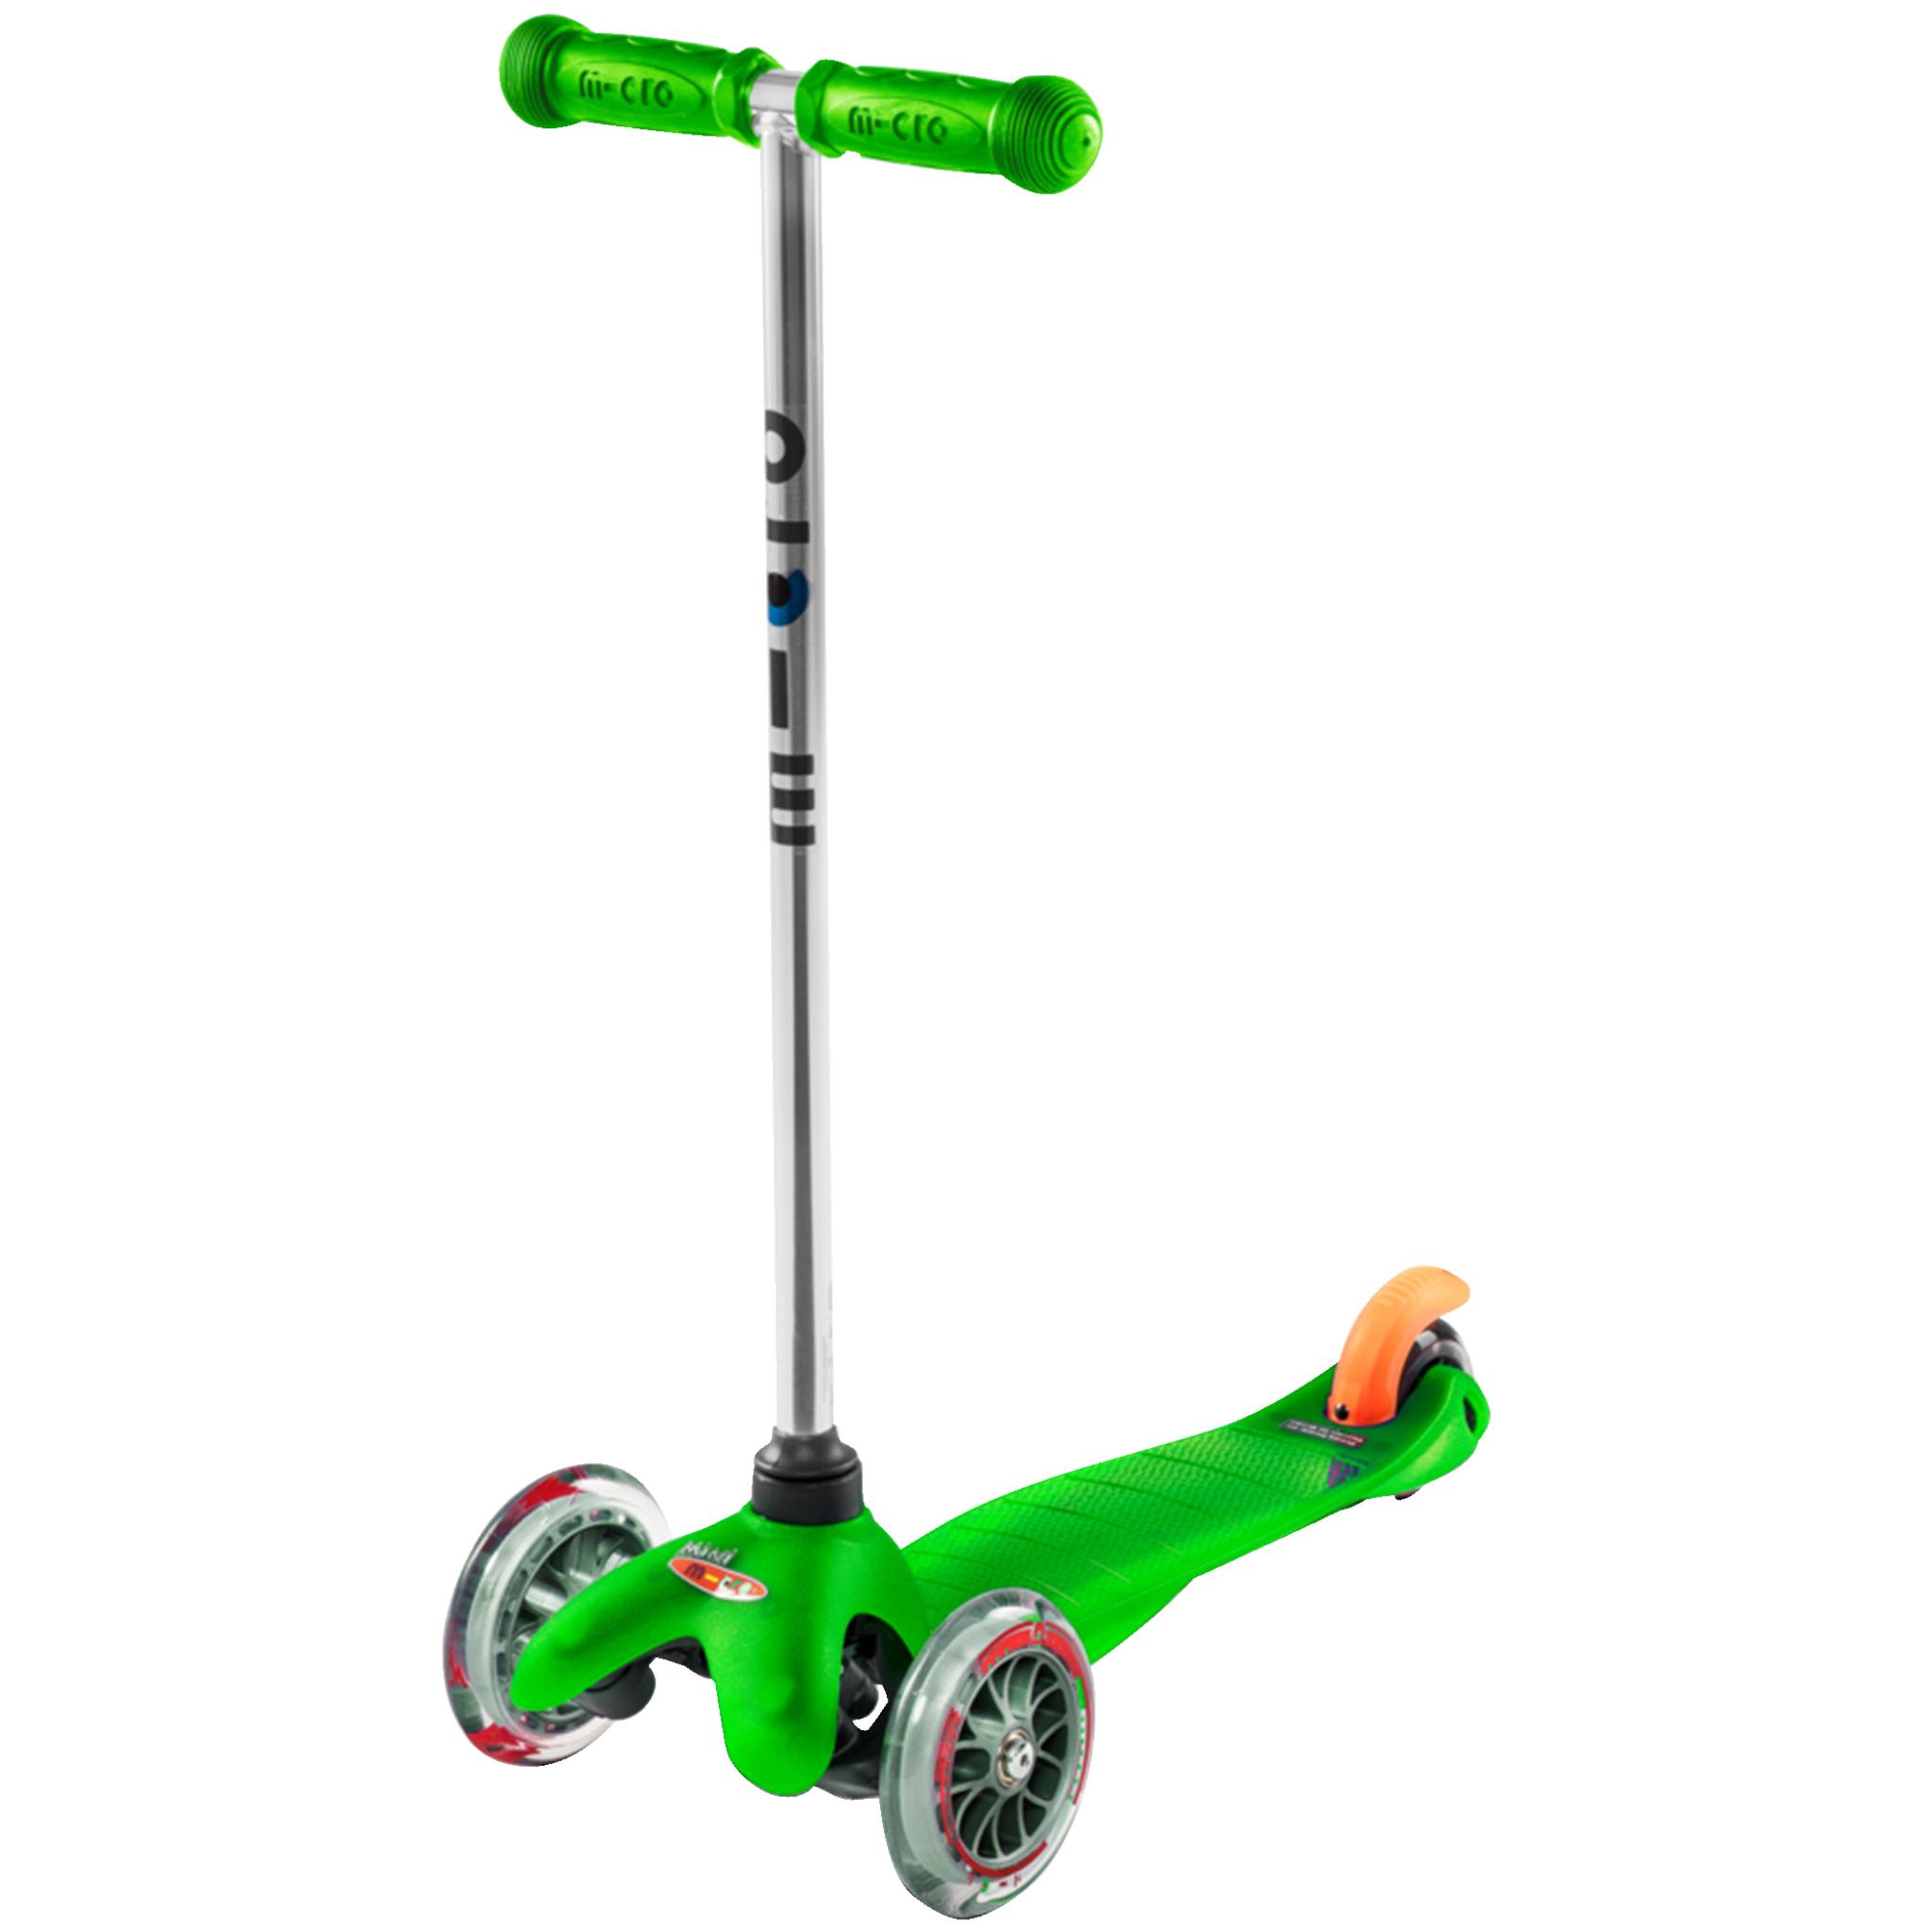 Micro MiniMicro green 3 scooter, sparkesykkel